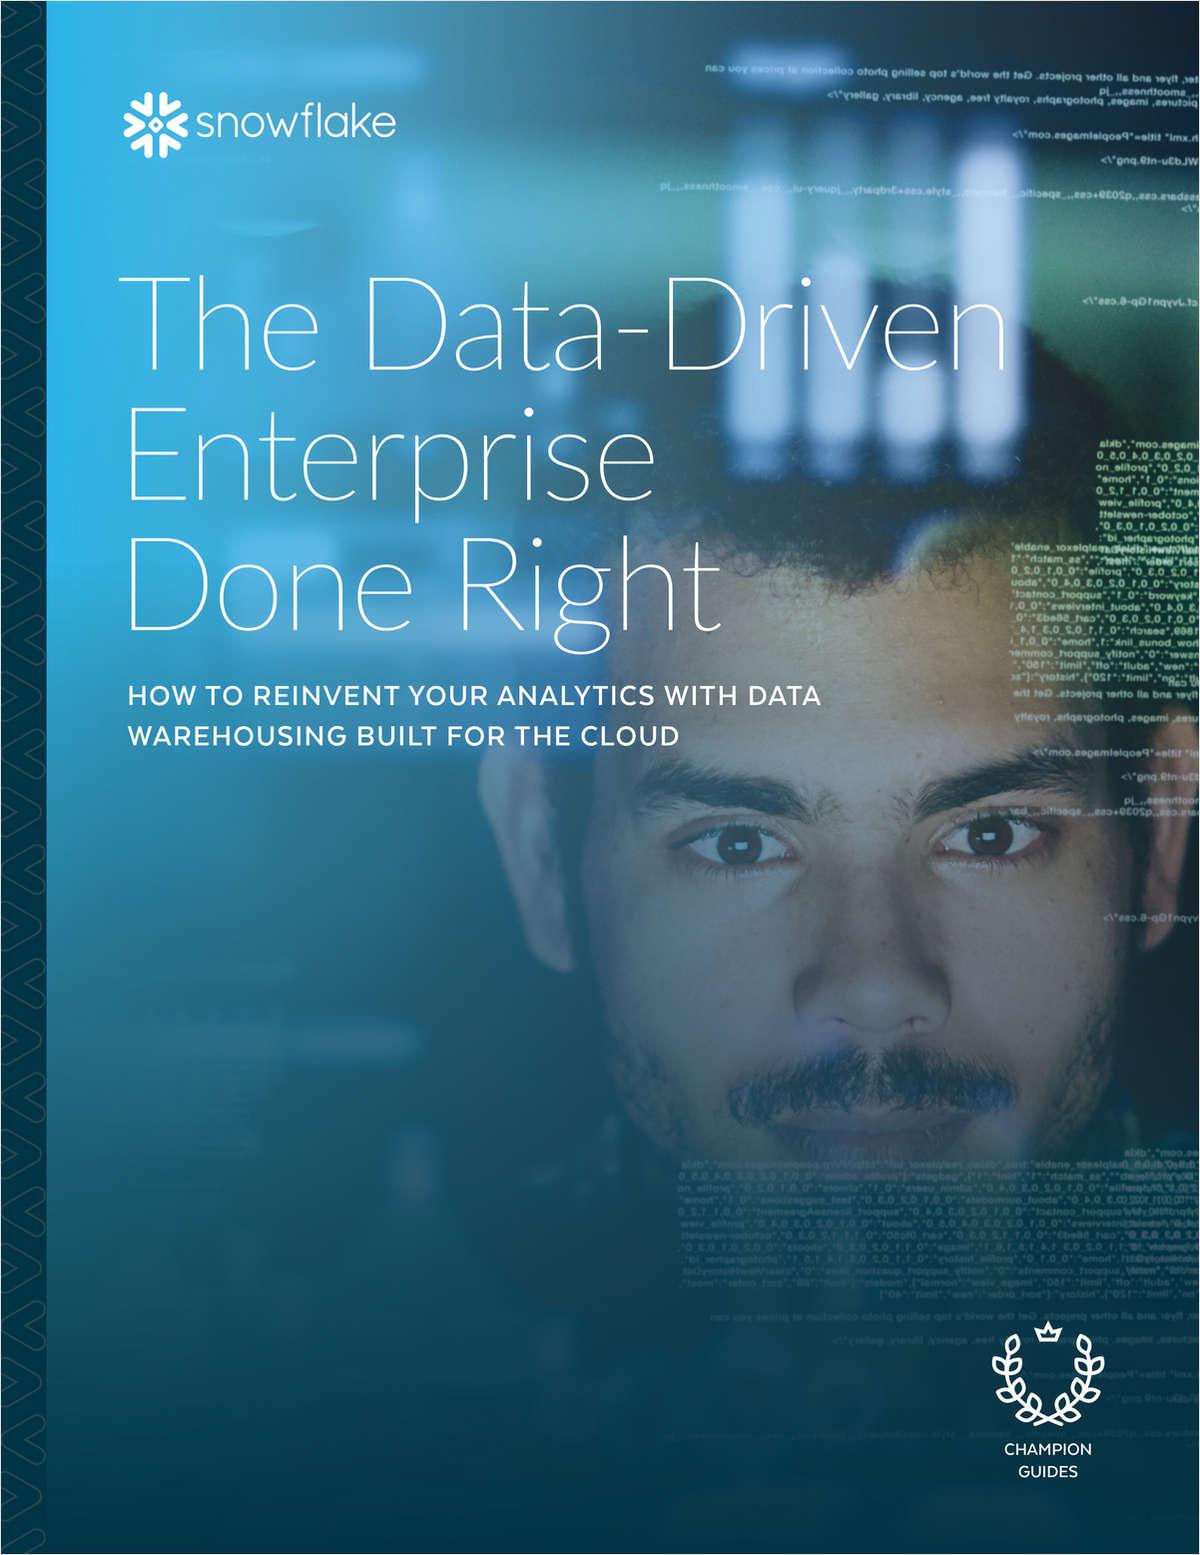 The Data Driven Enterprise Done Right